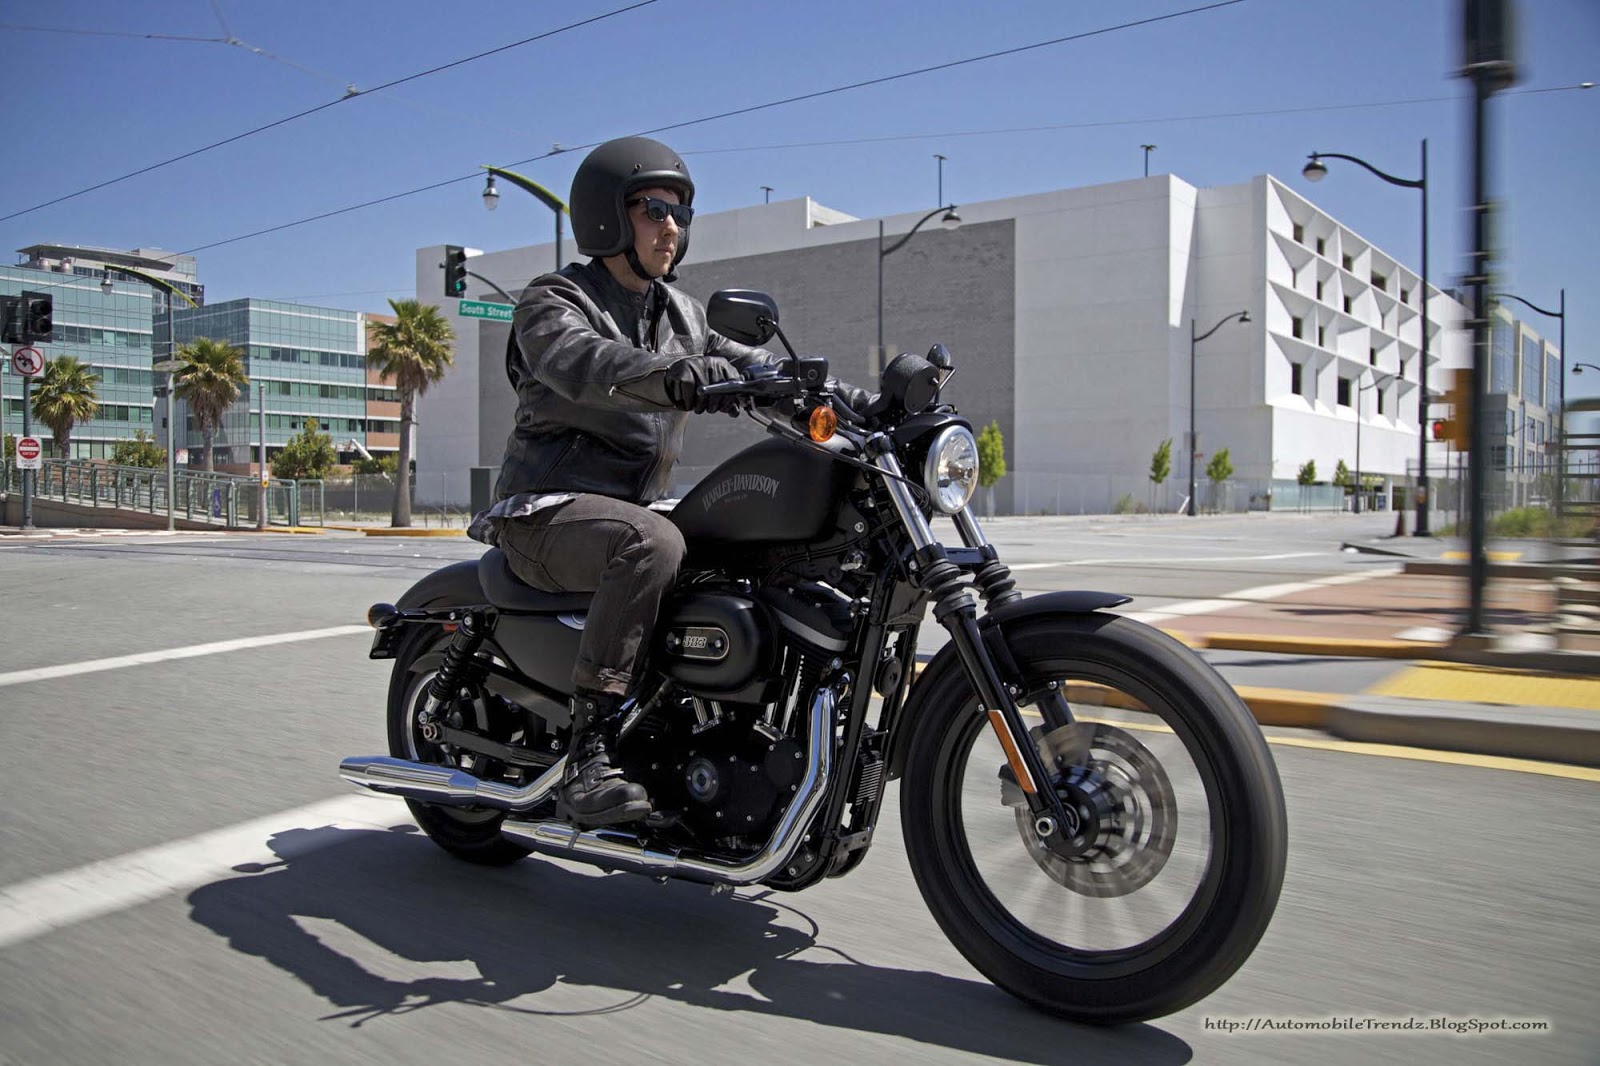 Automobile Trendz Harley Davidson 2013 Iron 883 4